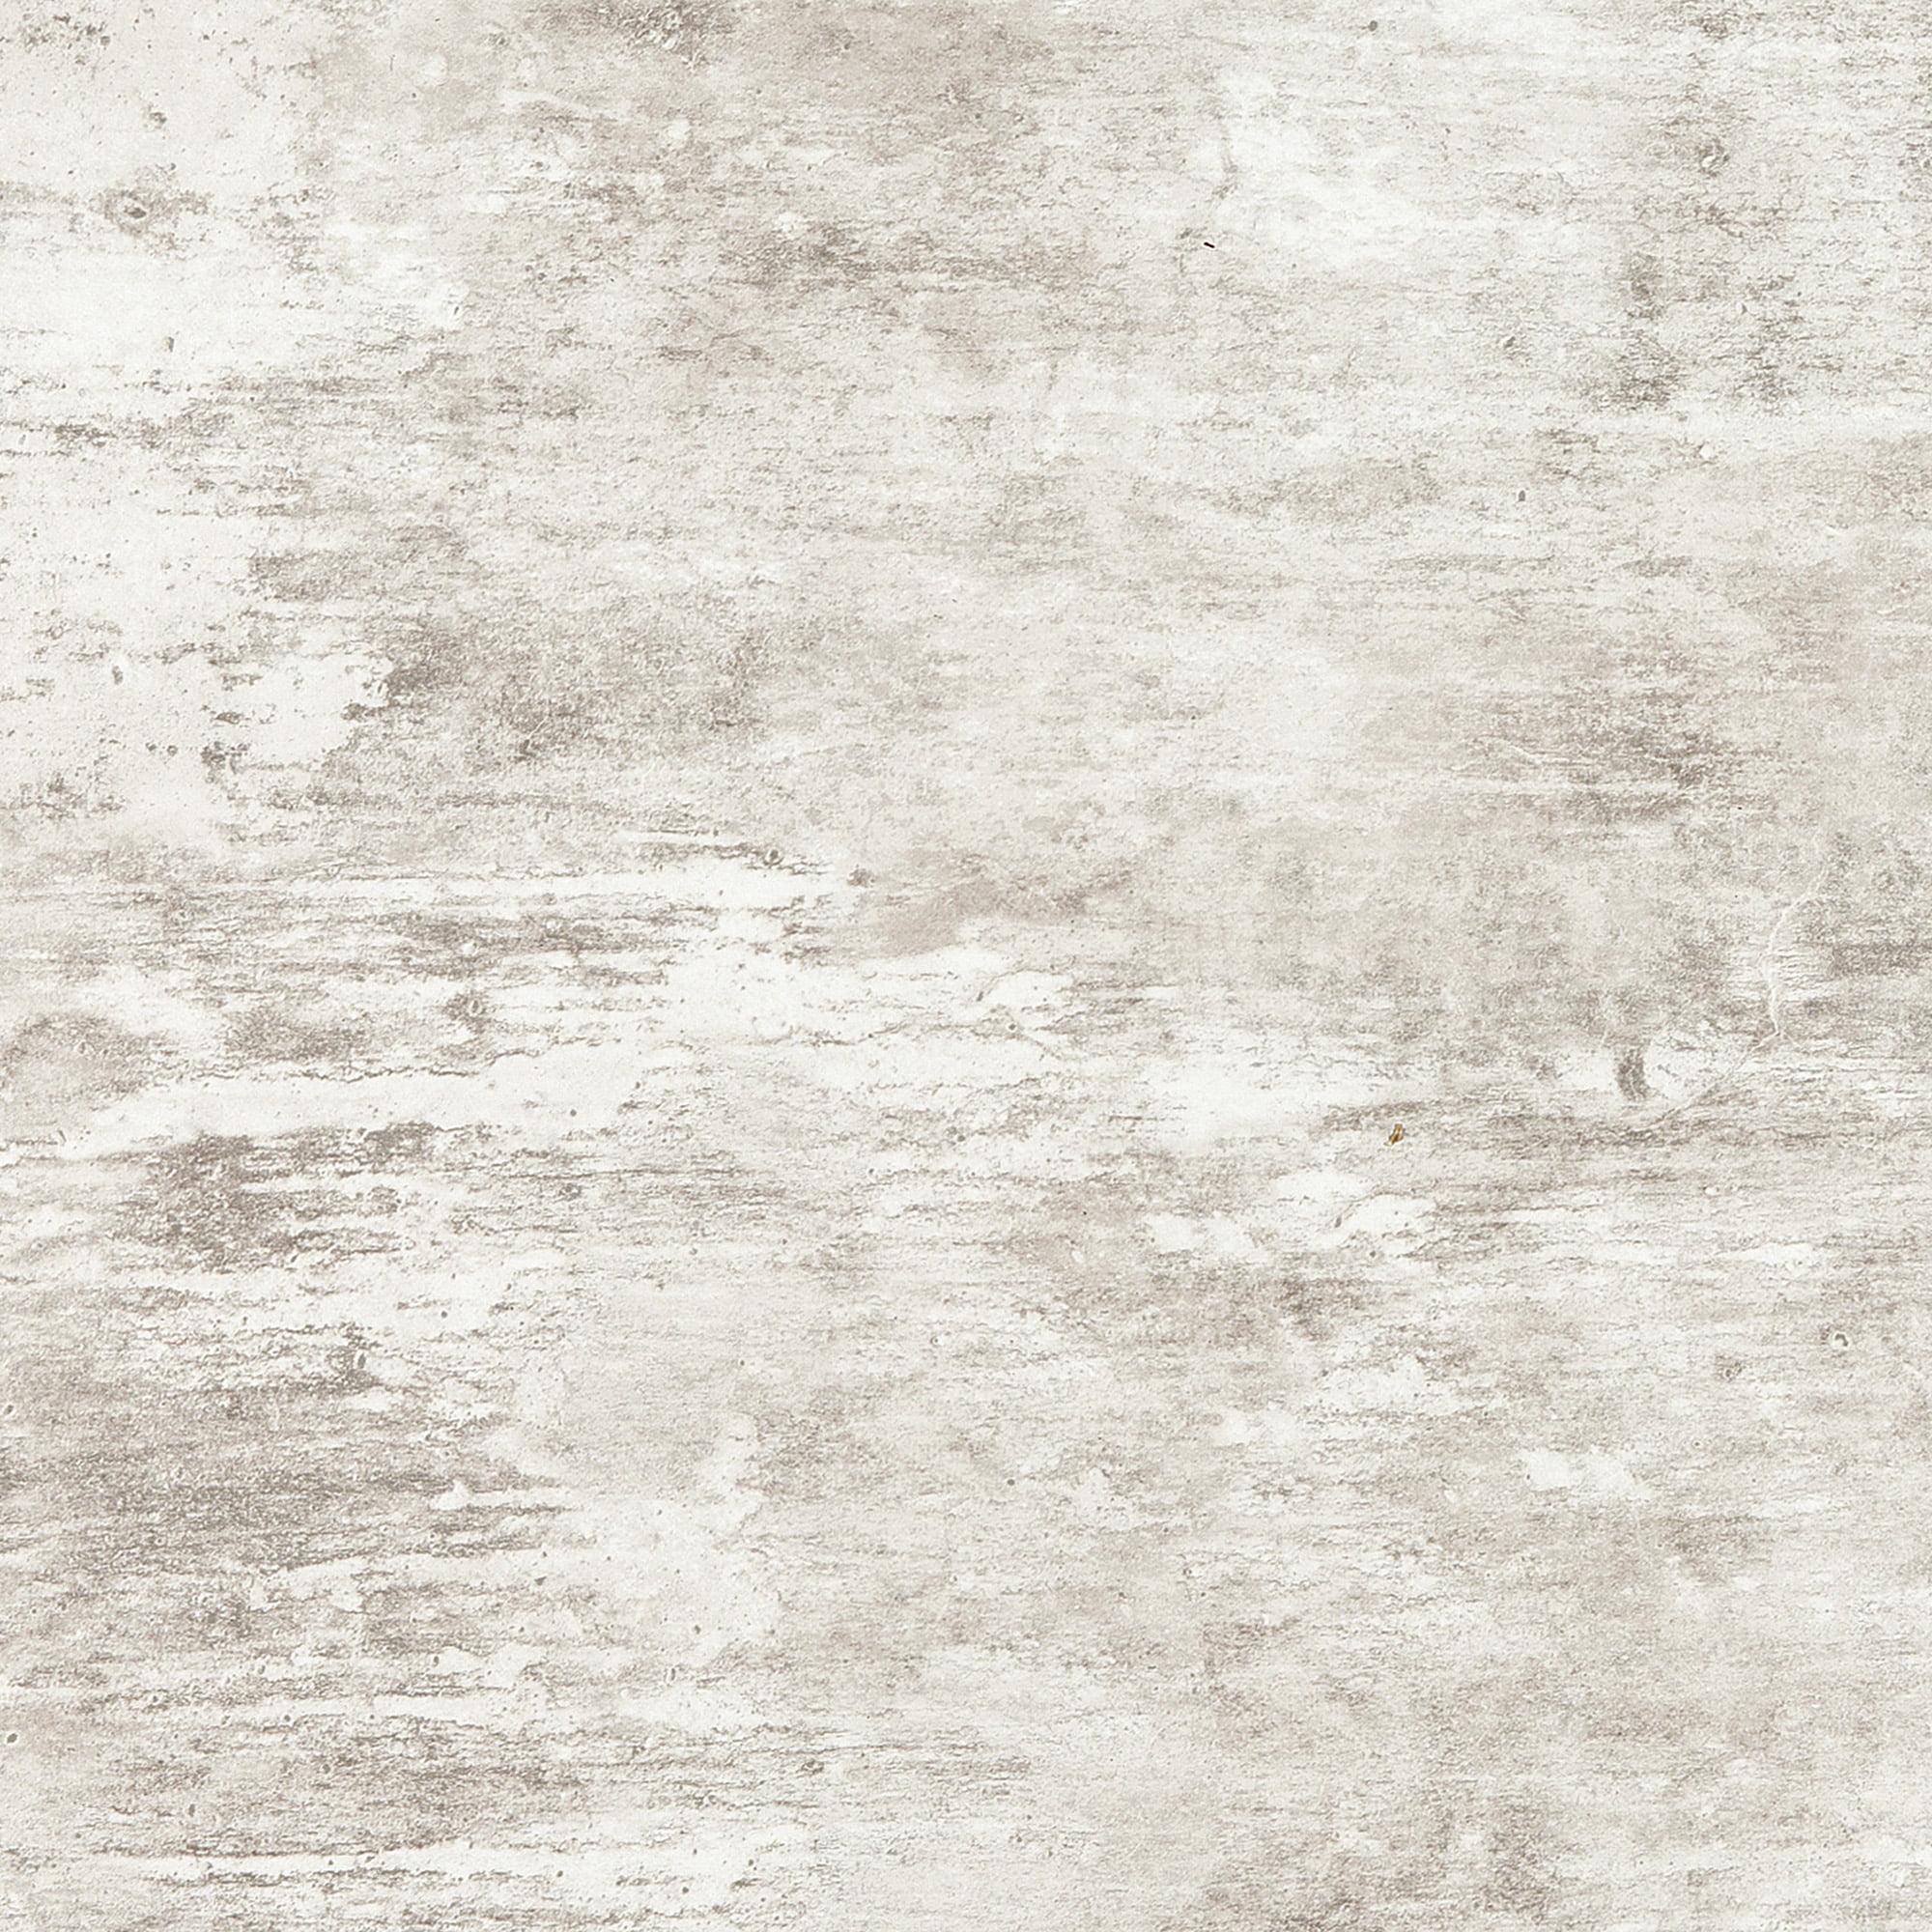 Interlocking Vinyl Wall Tile By Dumawall Waterproof Durable Backsplash Panels For Kitchen Bathroom Or Shower Wind Gust Sample Walmart Com Walmart Com